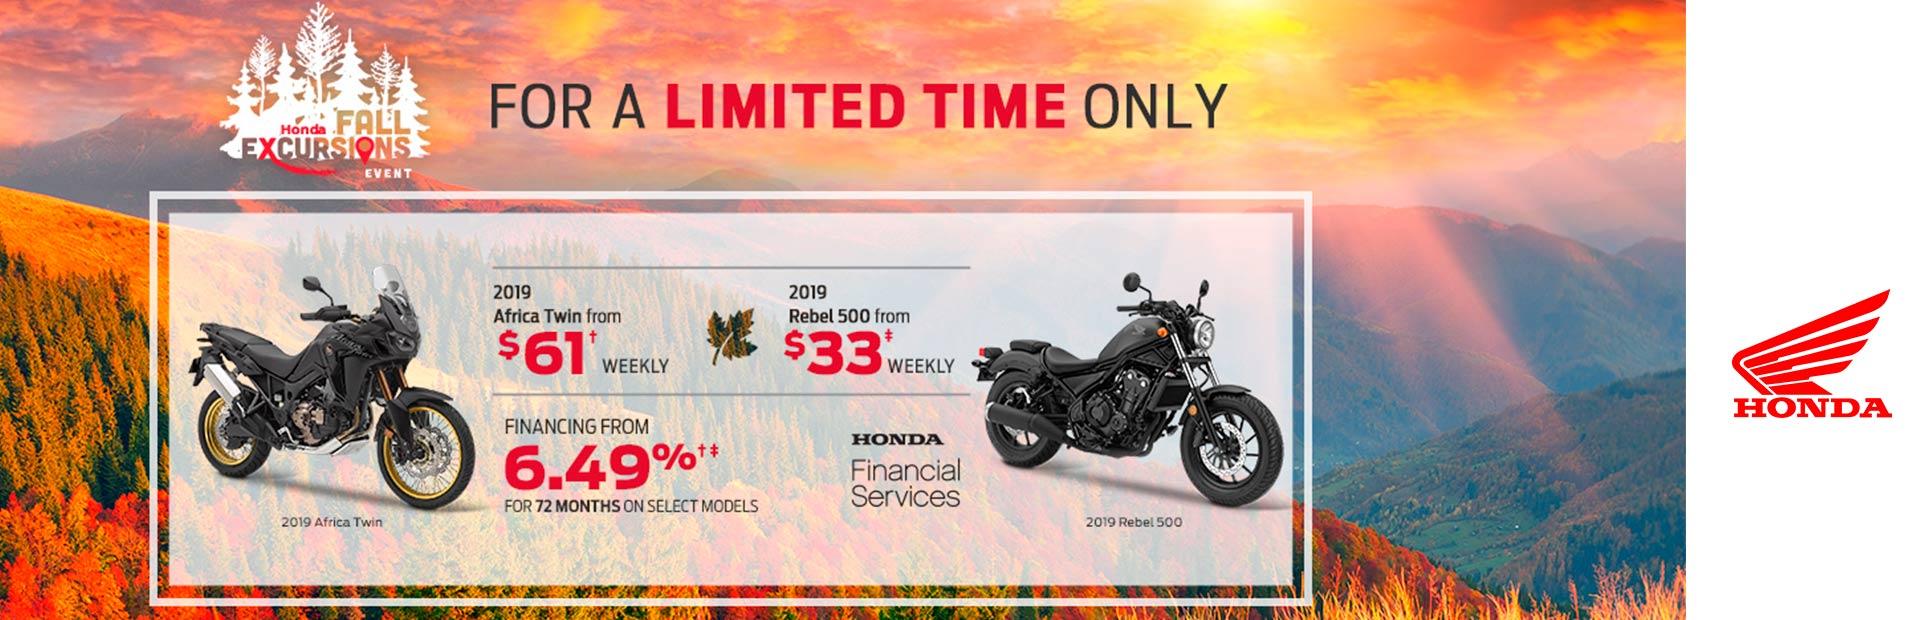 Honda Motorcycles Calgary >> Honda Honda Fall Excursions Motorcycles Rocky Mountain